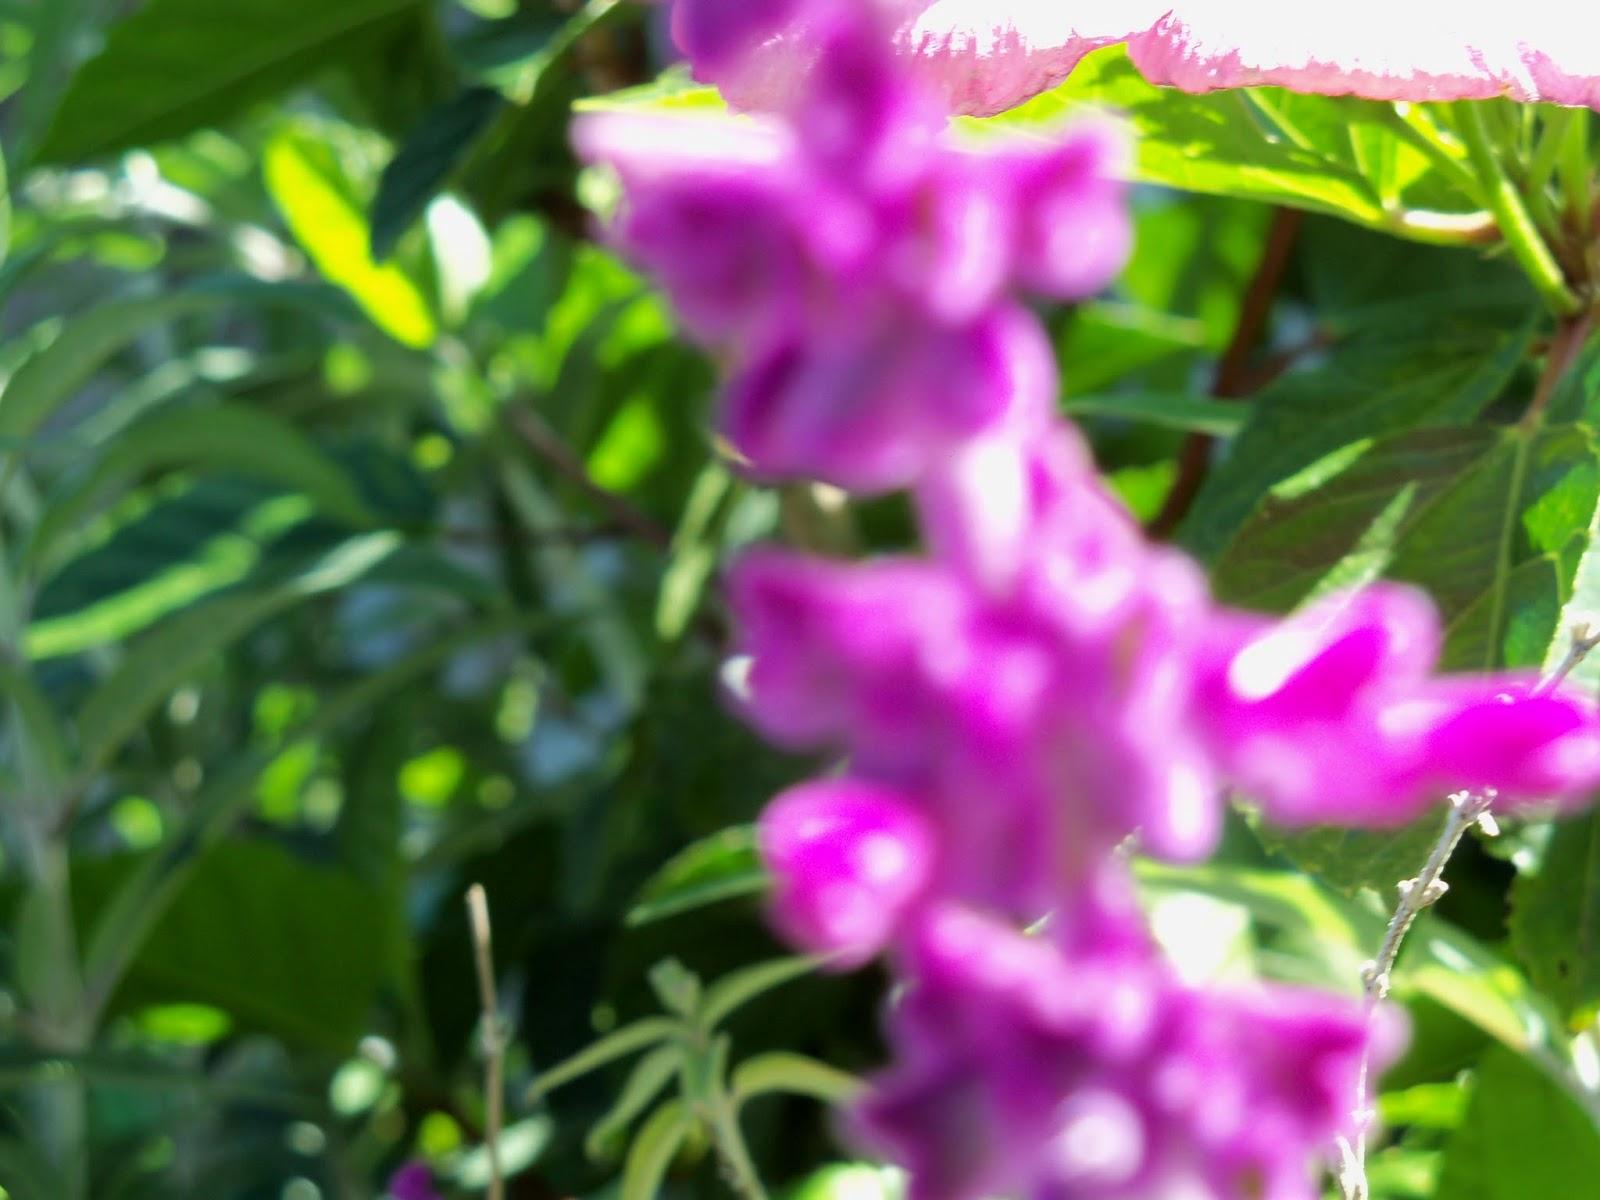 Gardening 2013 - 115_6218.JPG